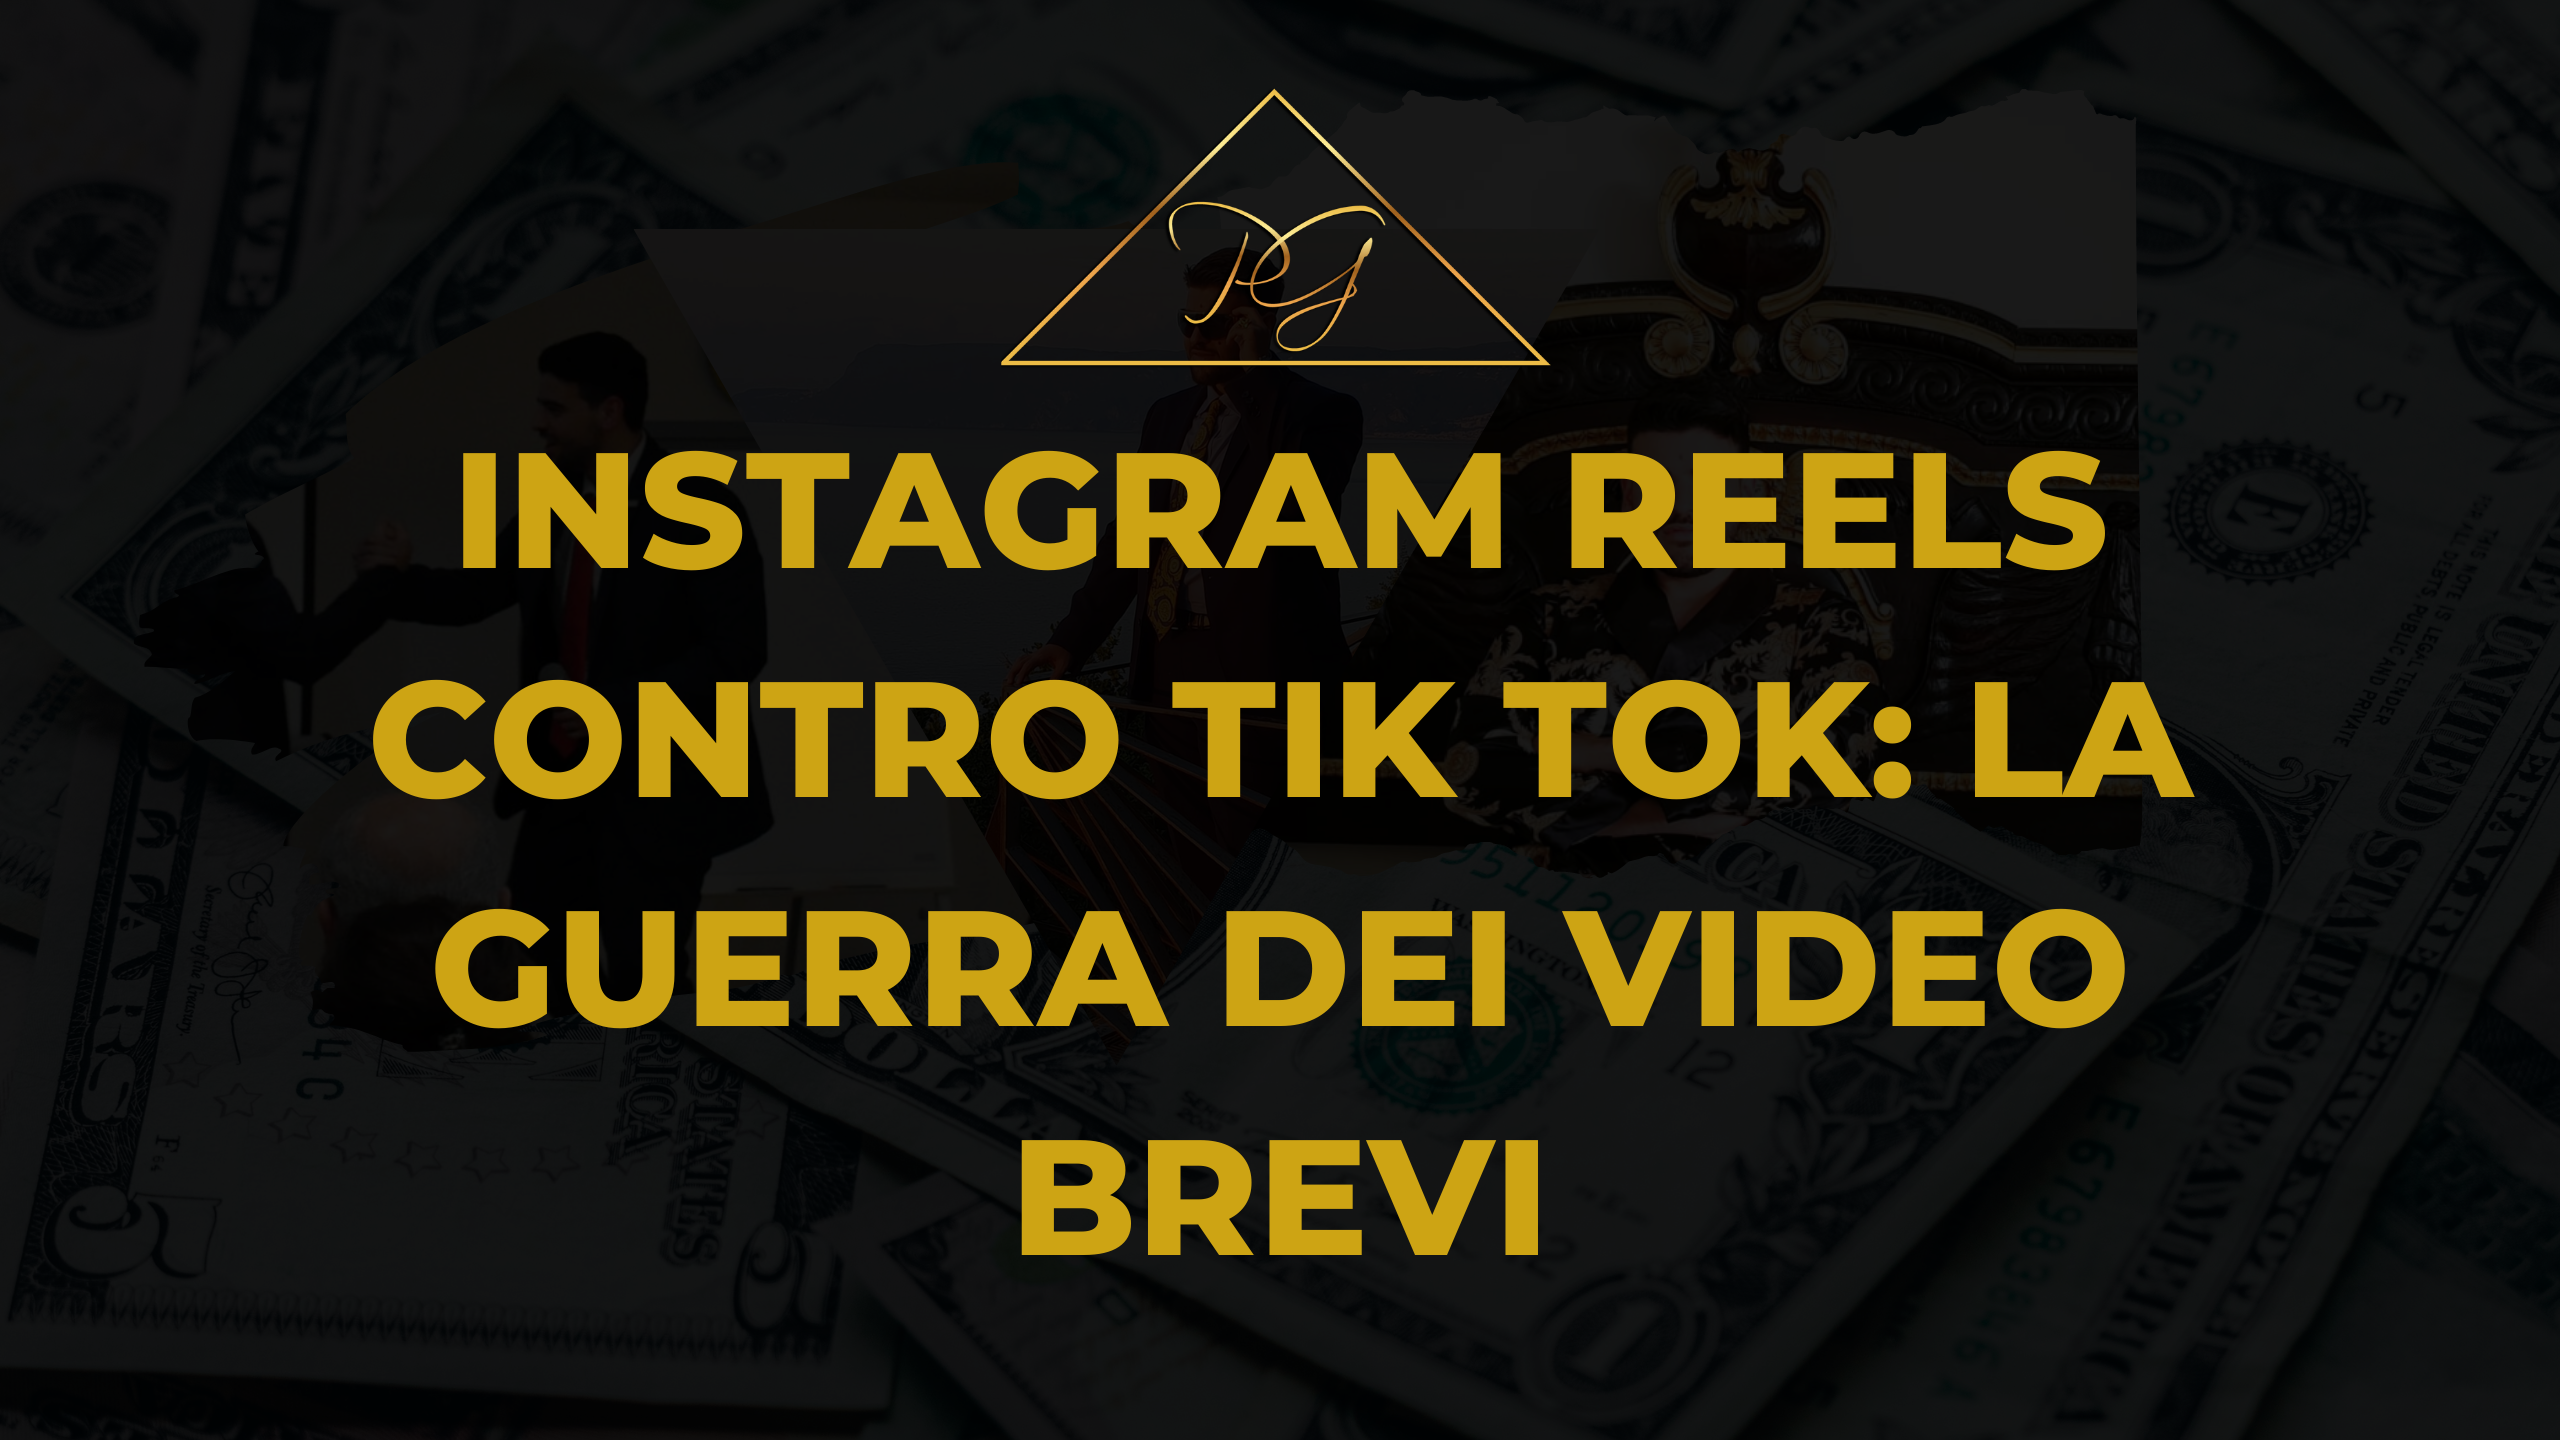 Instagram Reels contro Tik Tok